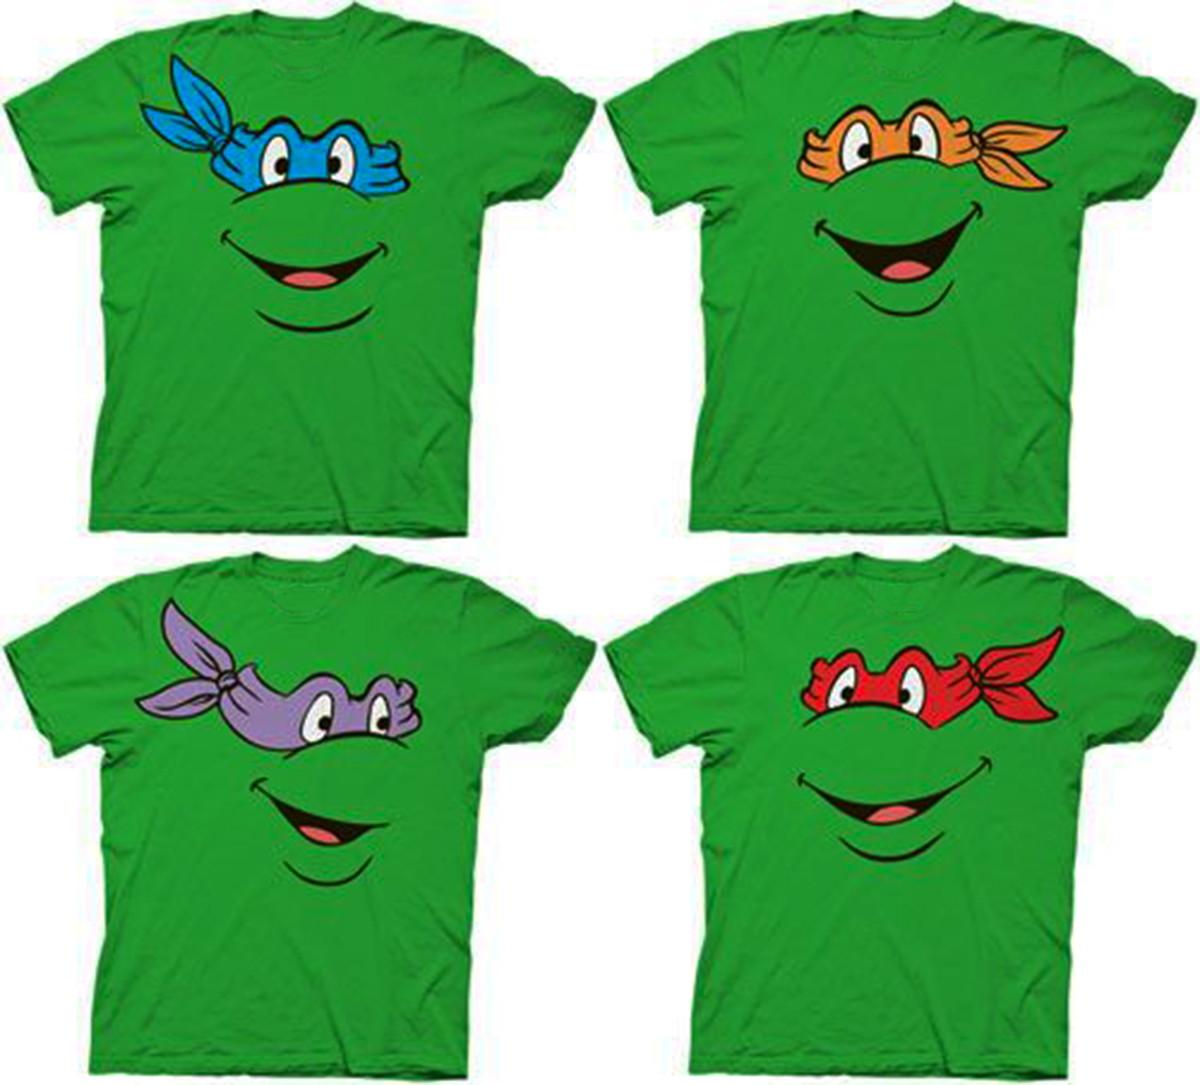 Camiseta Tartarugas Ninja no Elo7  05e2e14f5eb8a